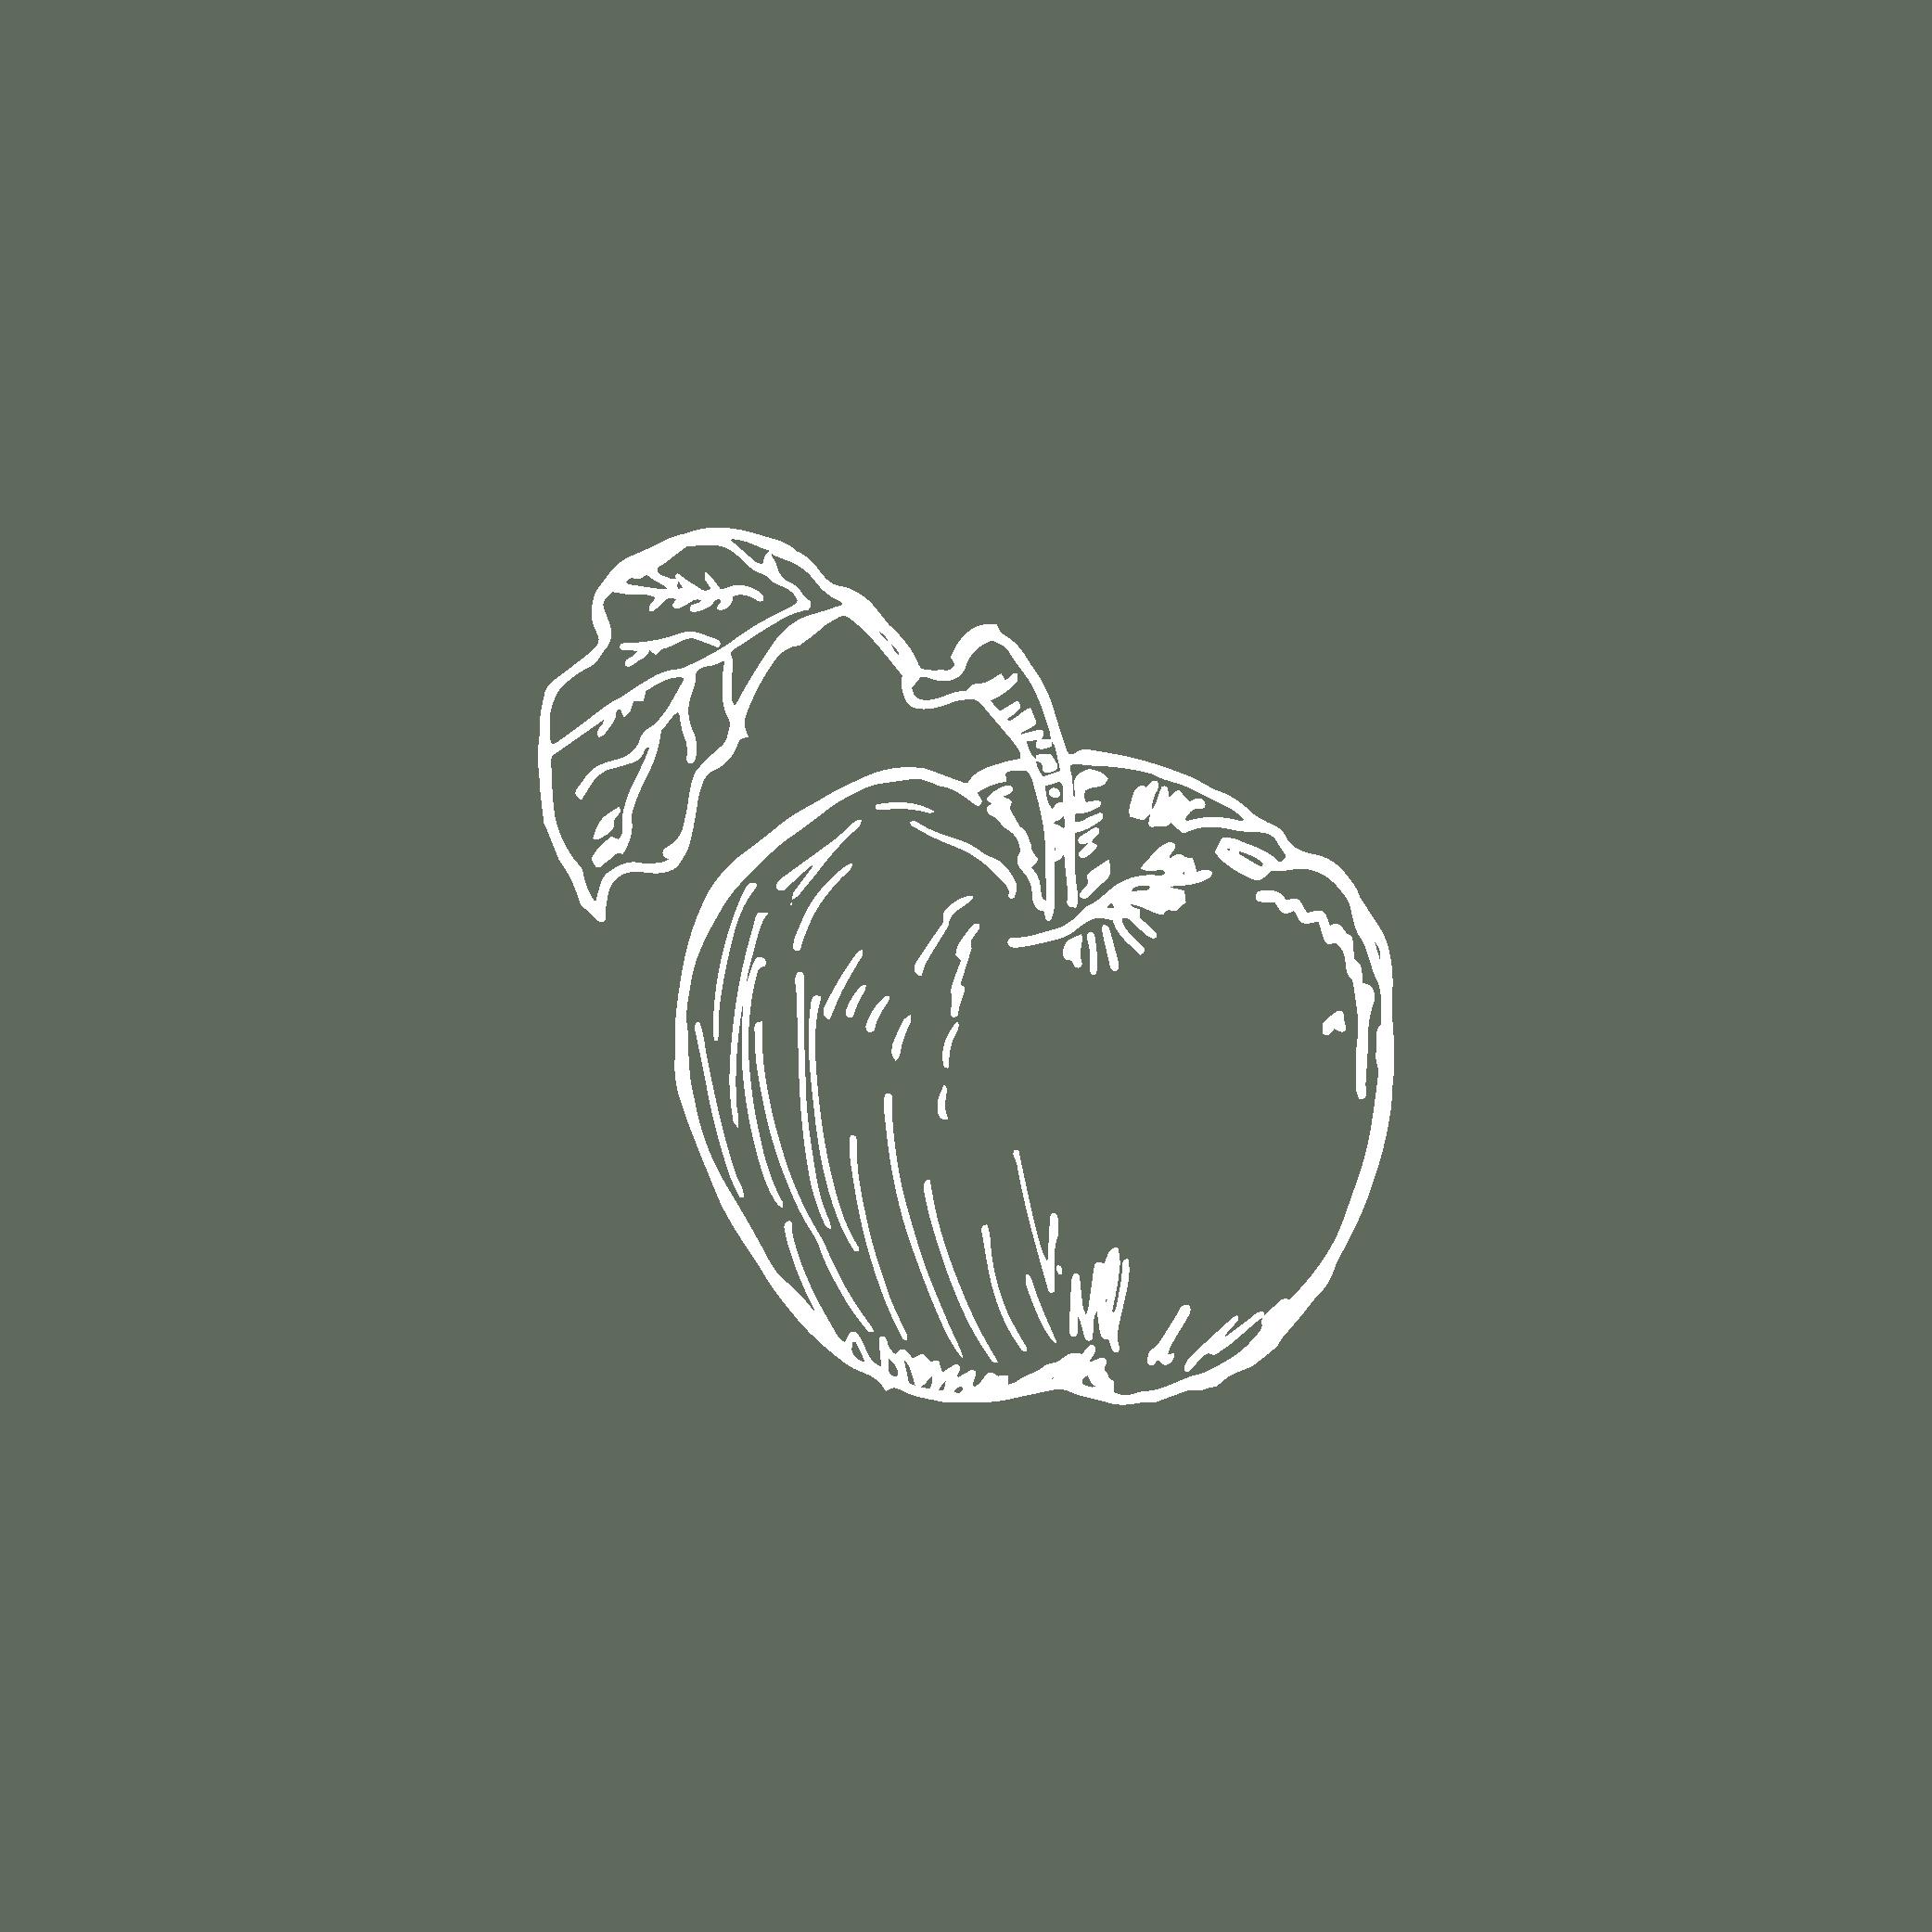 OrganicKitchen_Branding_Natural_Food_Whole_Logo9.png